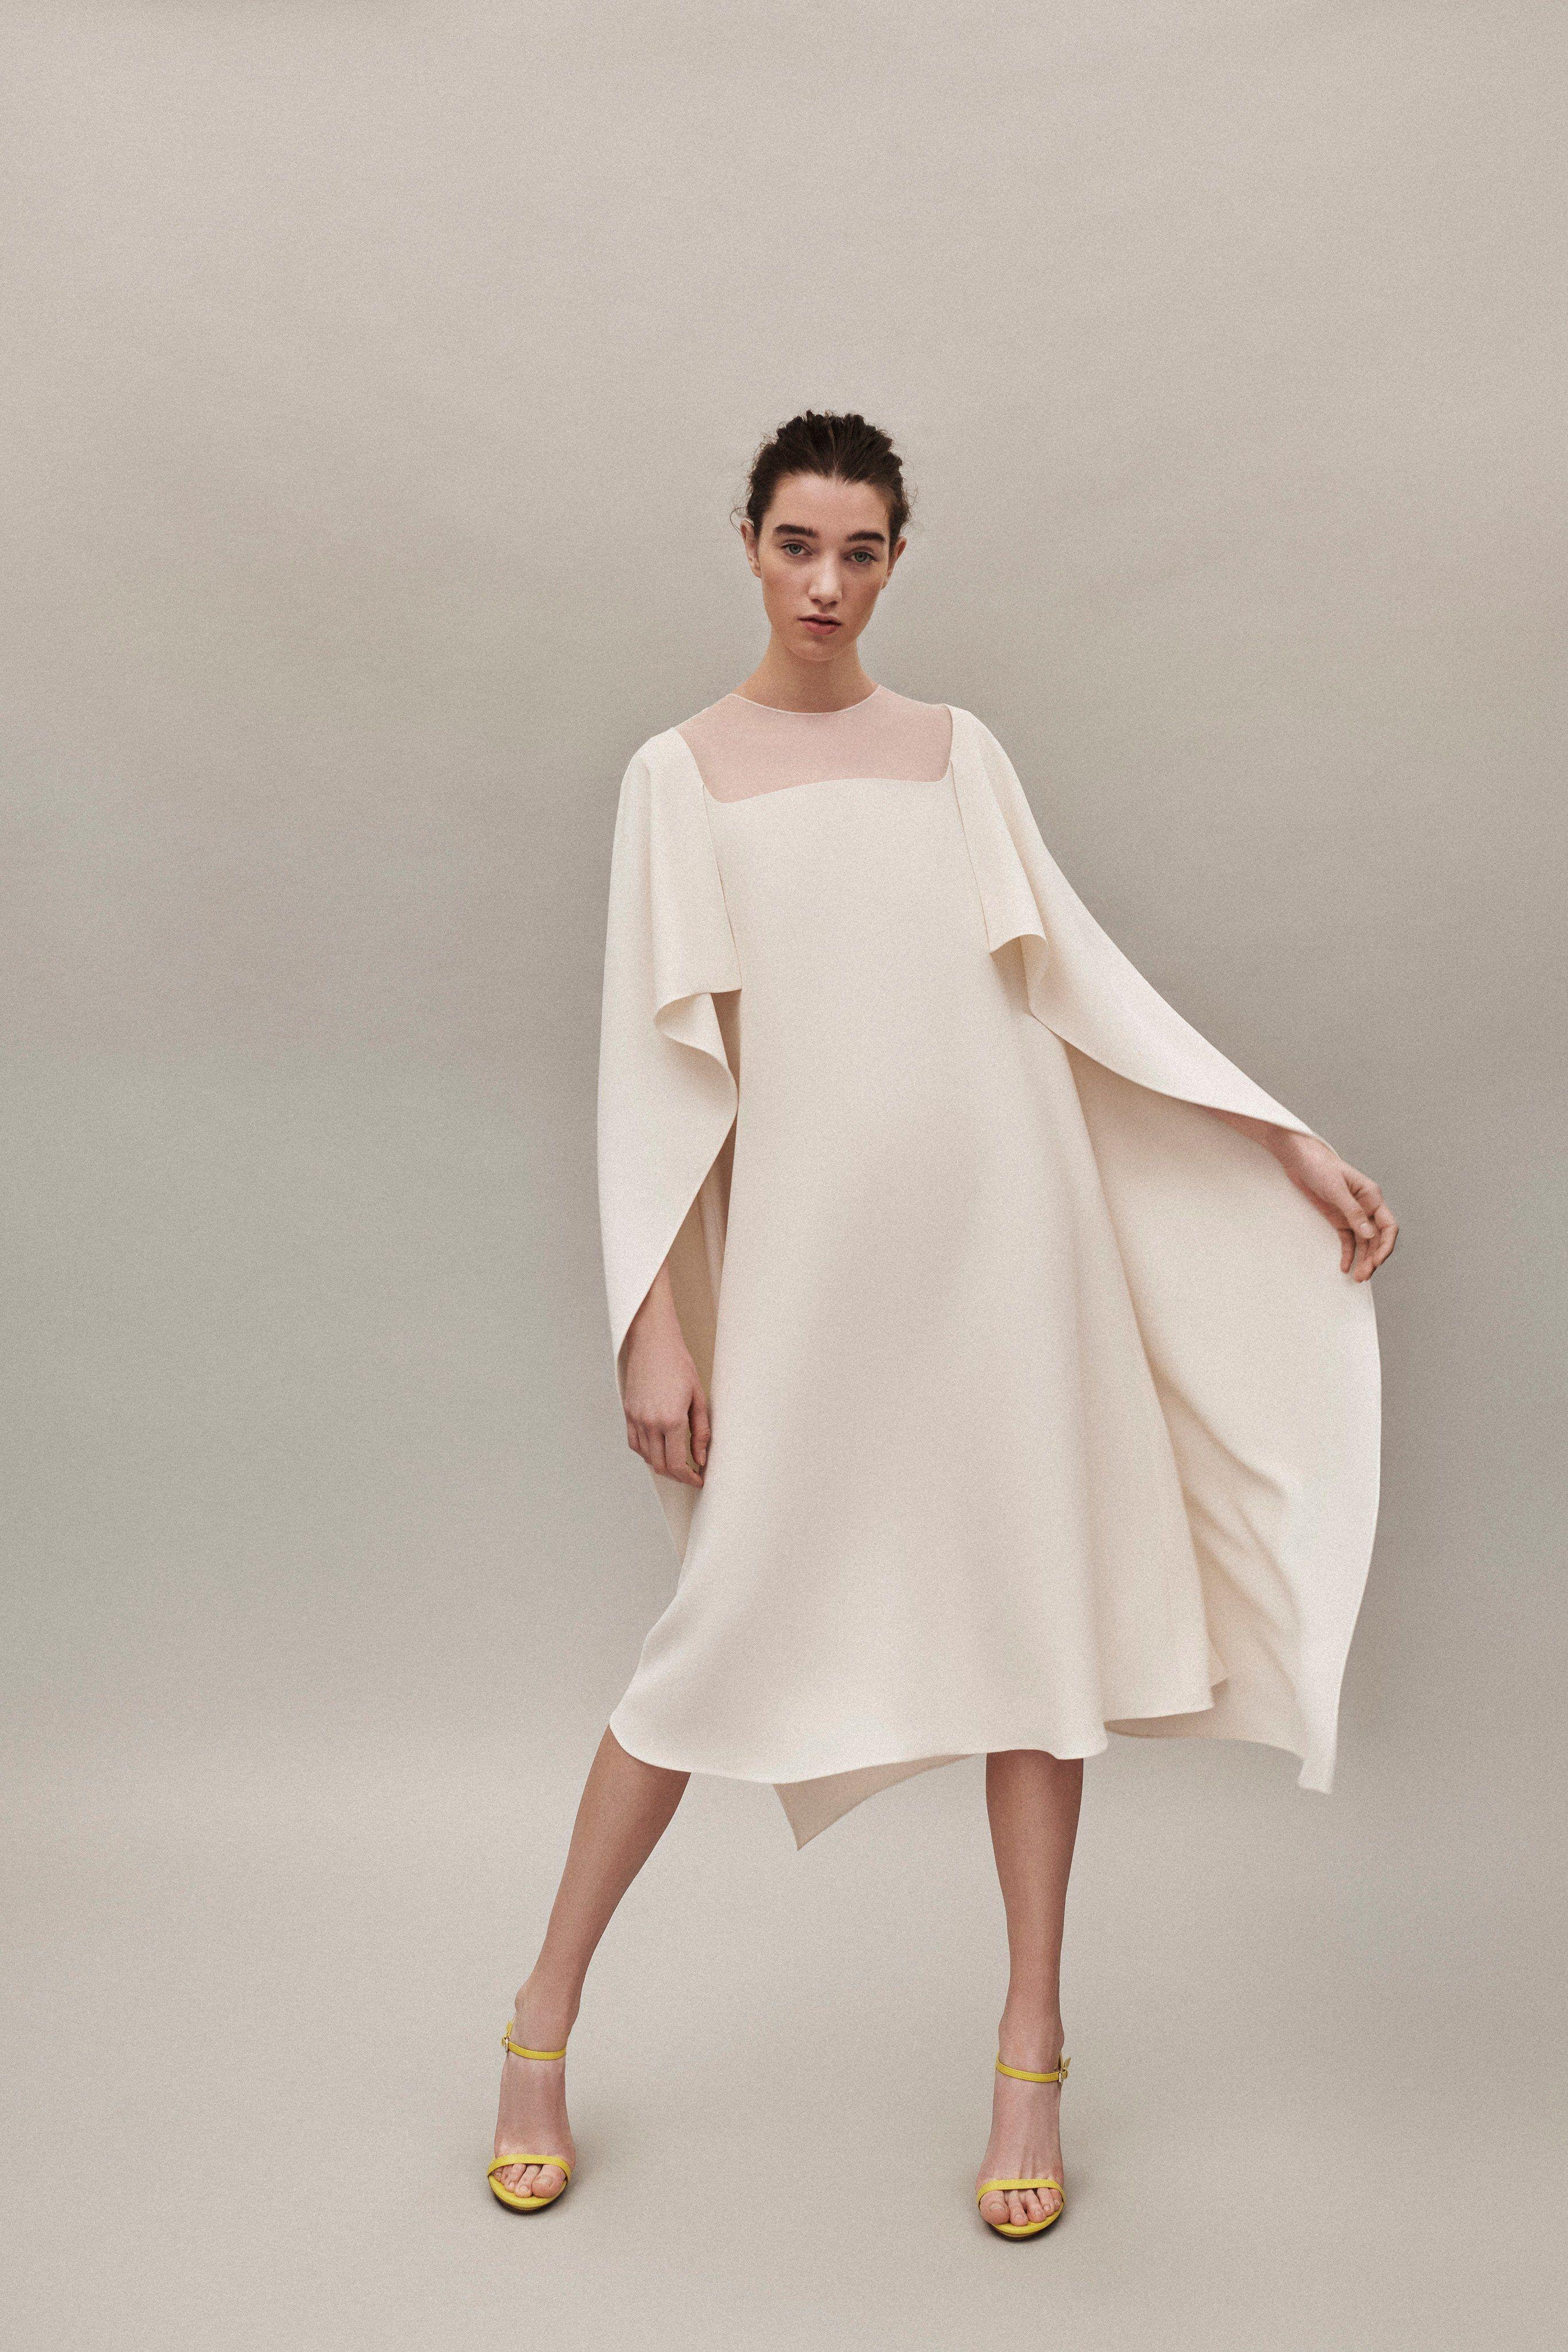 Delpozo Minimalist Dress Clothia Minimalist Fashion Summer Minimalist Dresses Fashion [ 4098 x 2732 Pixel ]